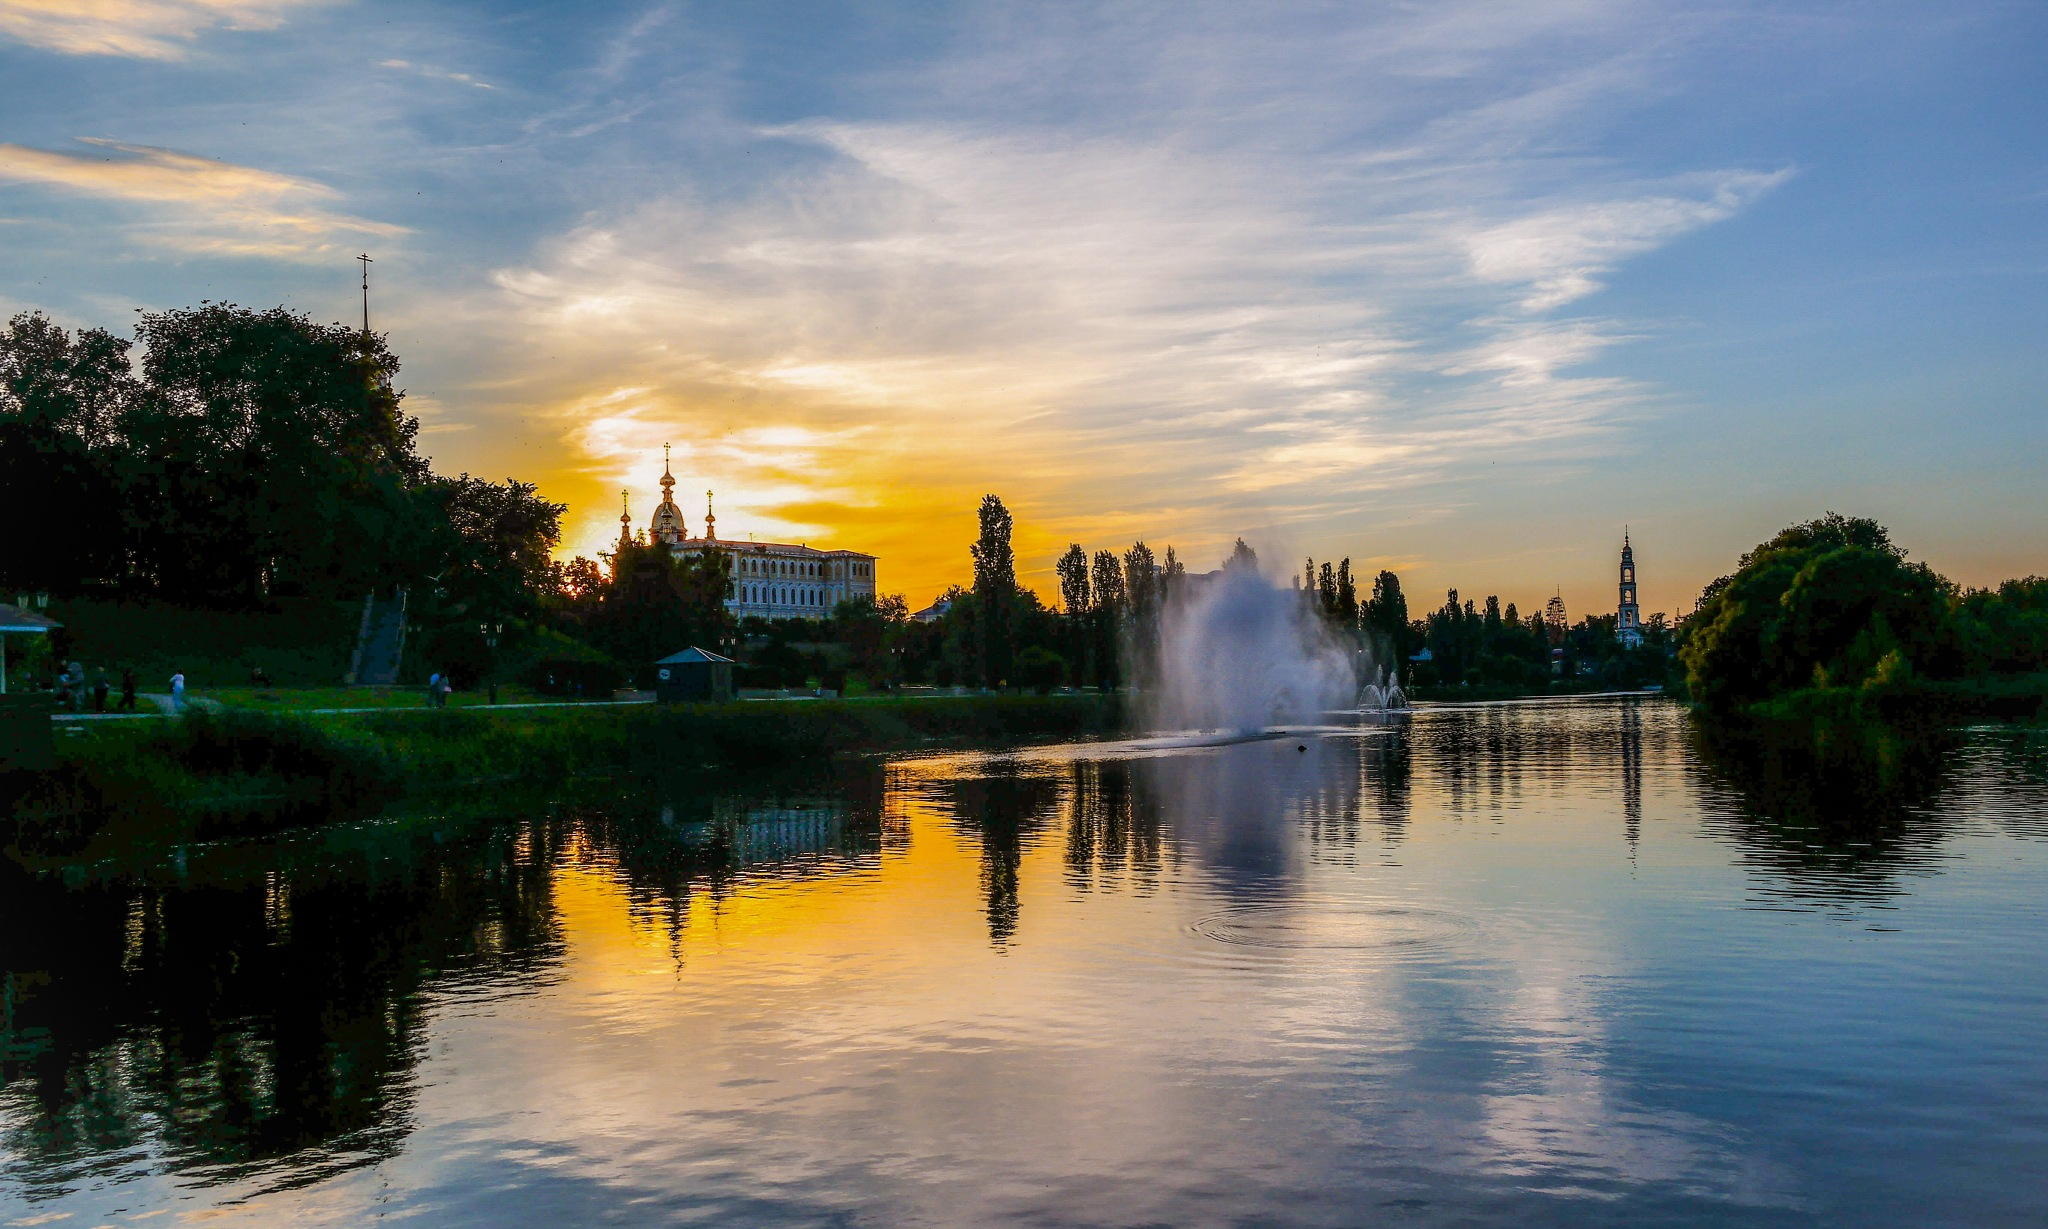 On the river Tsna............. by Alexandr  Seleznev